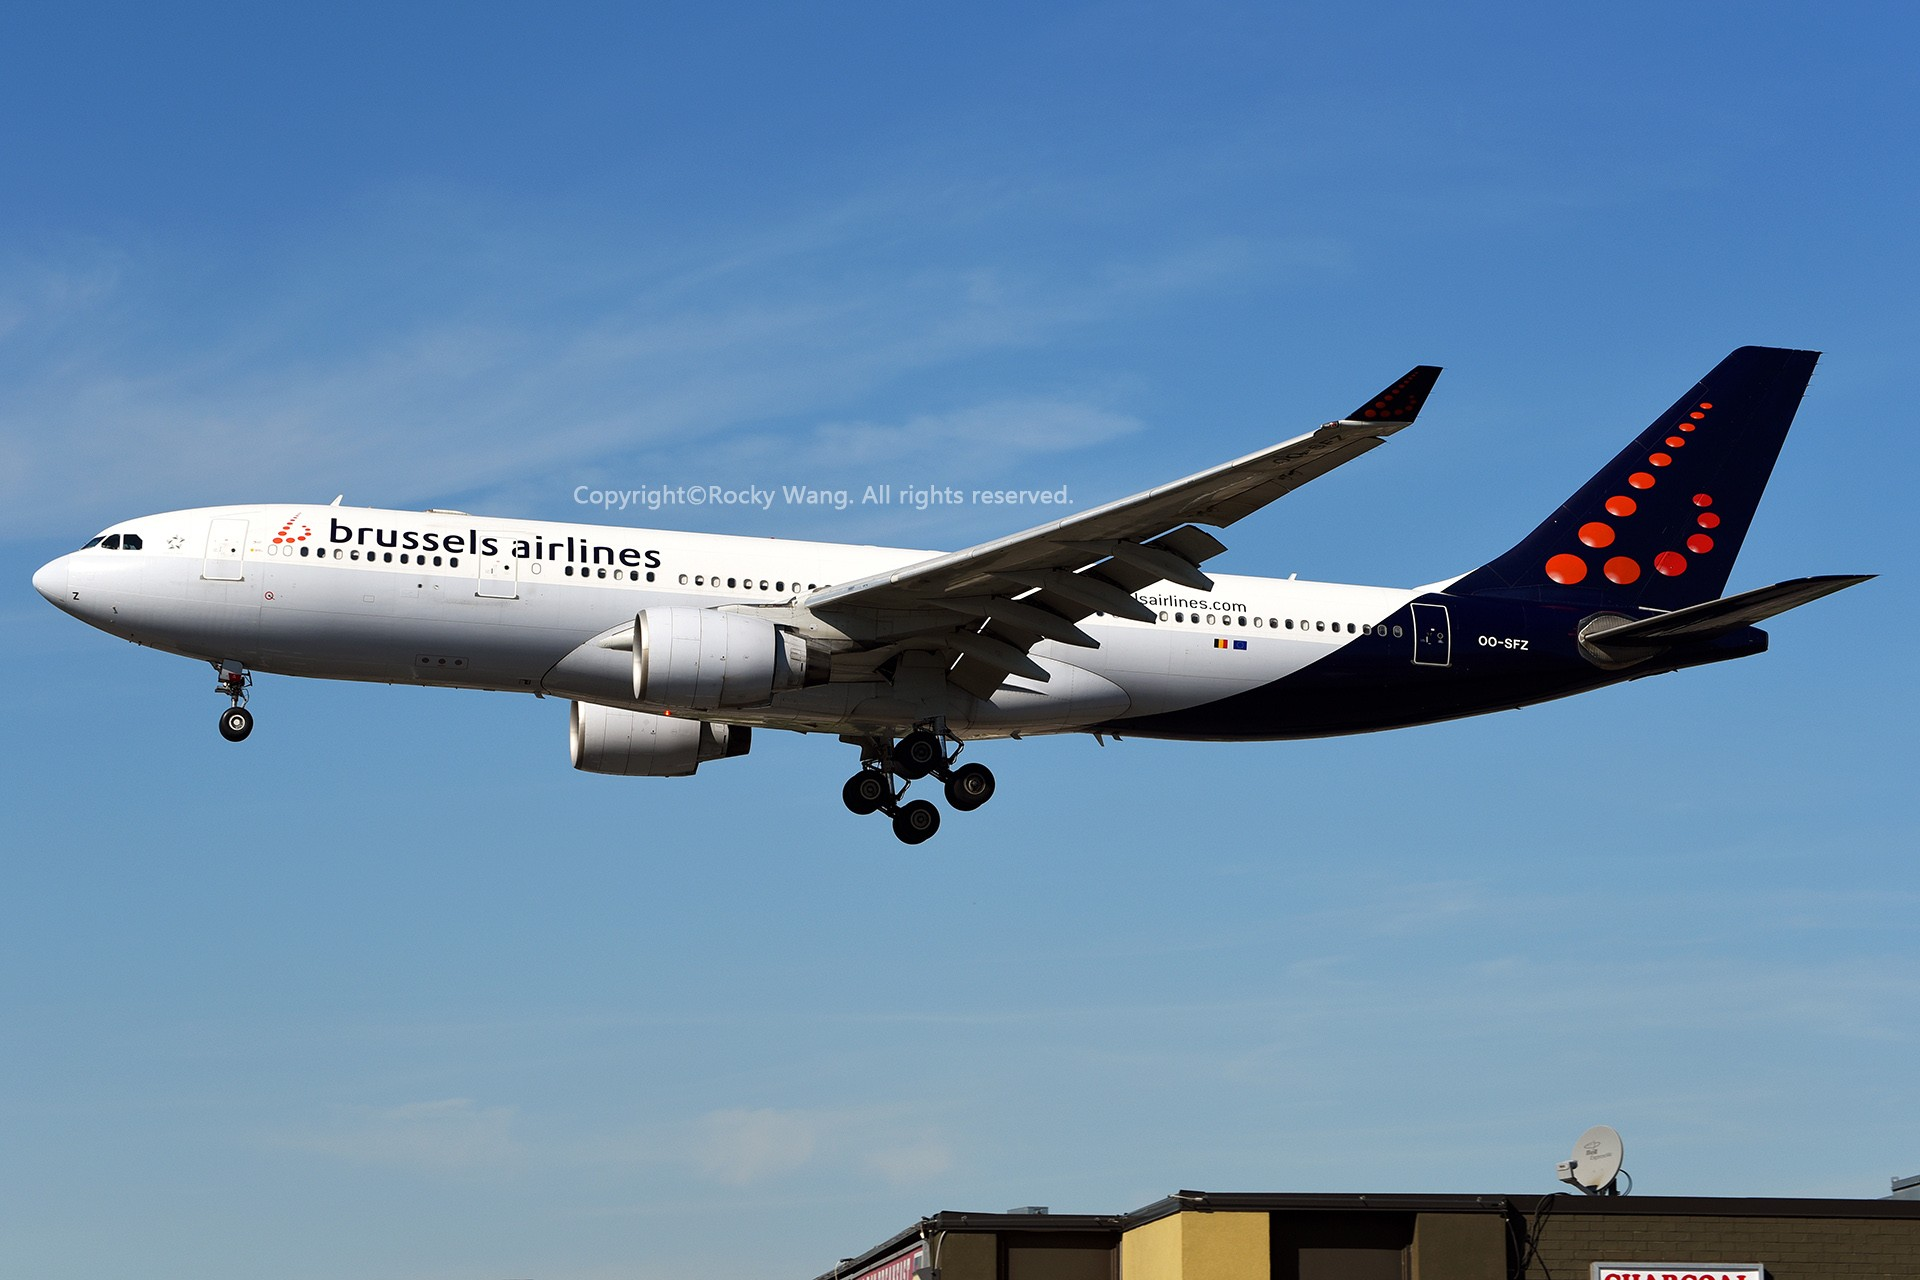 Re:[原创]A330s Around the World AIRBUS A330-223 OO-SFZ 加拿大多伦多皮尔逊机场